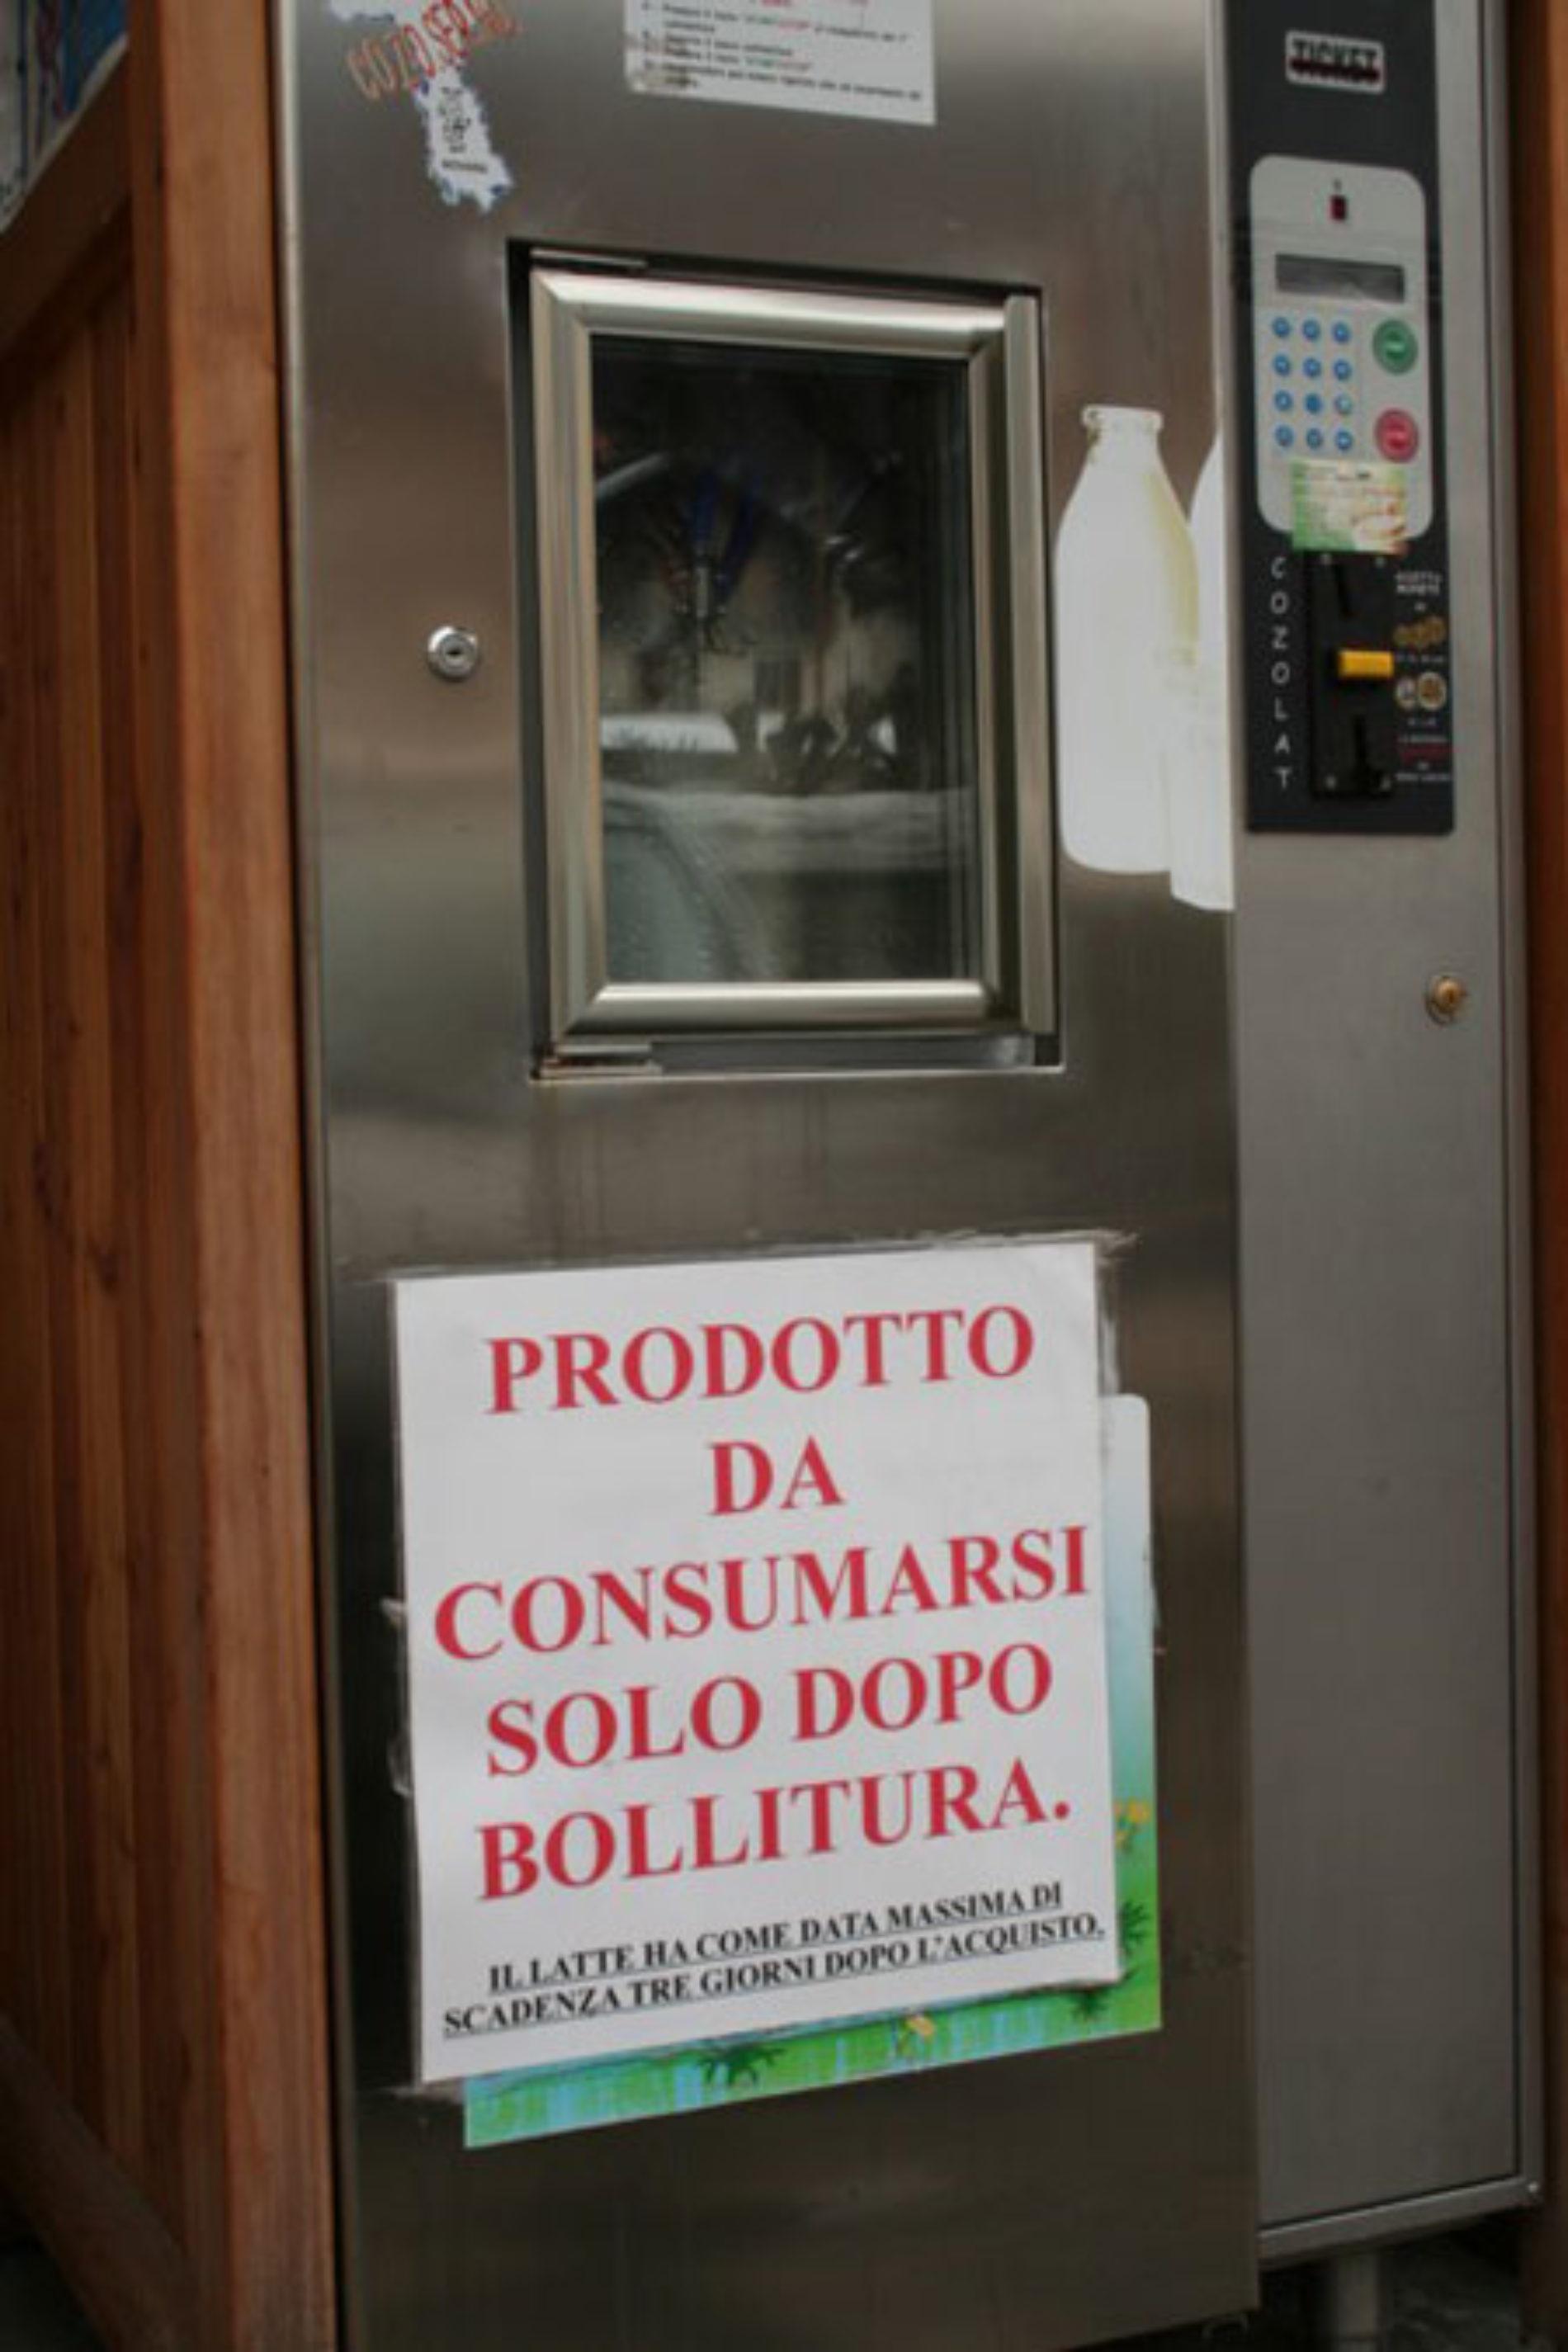 Distributori automatici di latte crudo. Interviene l'EFSA